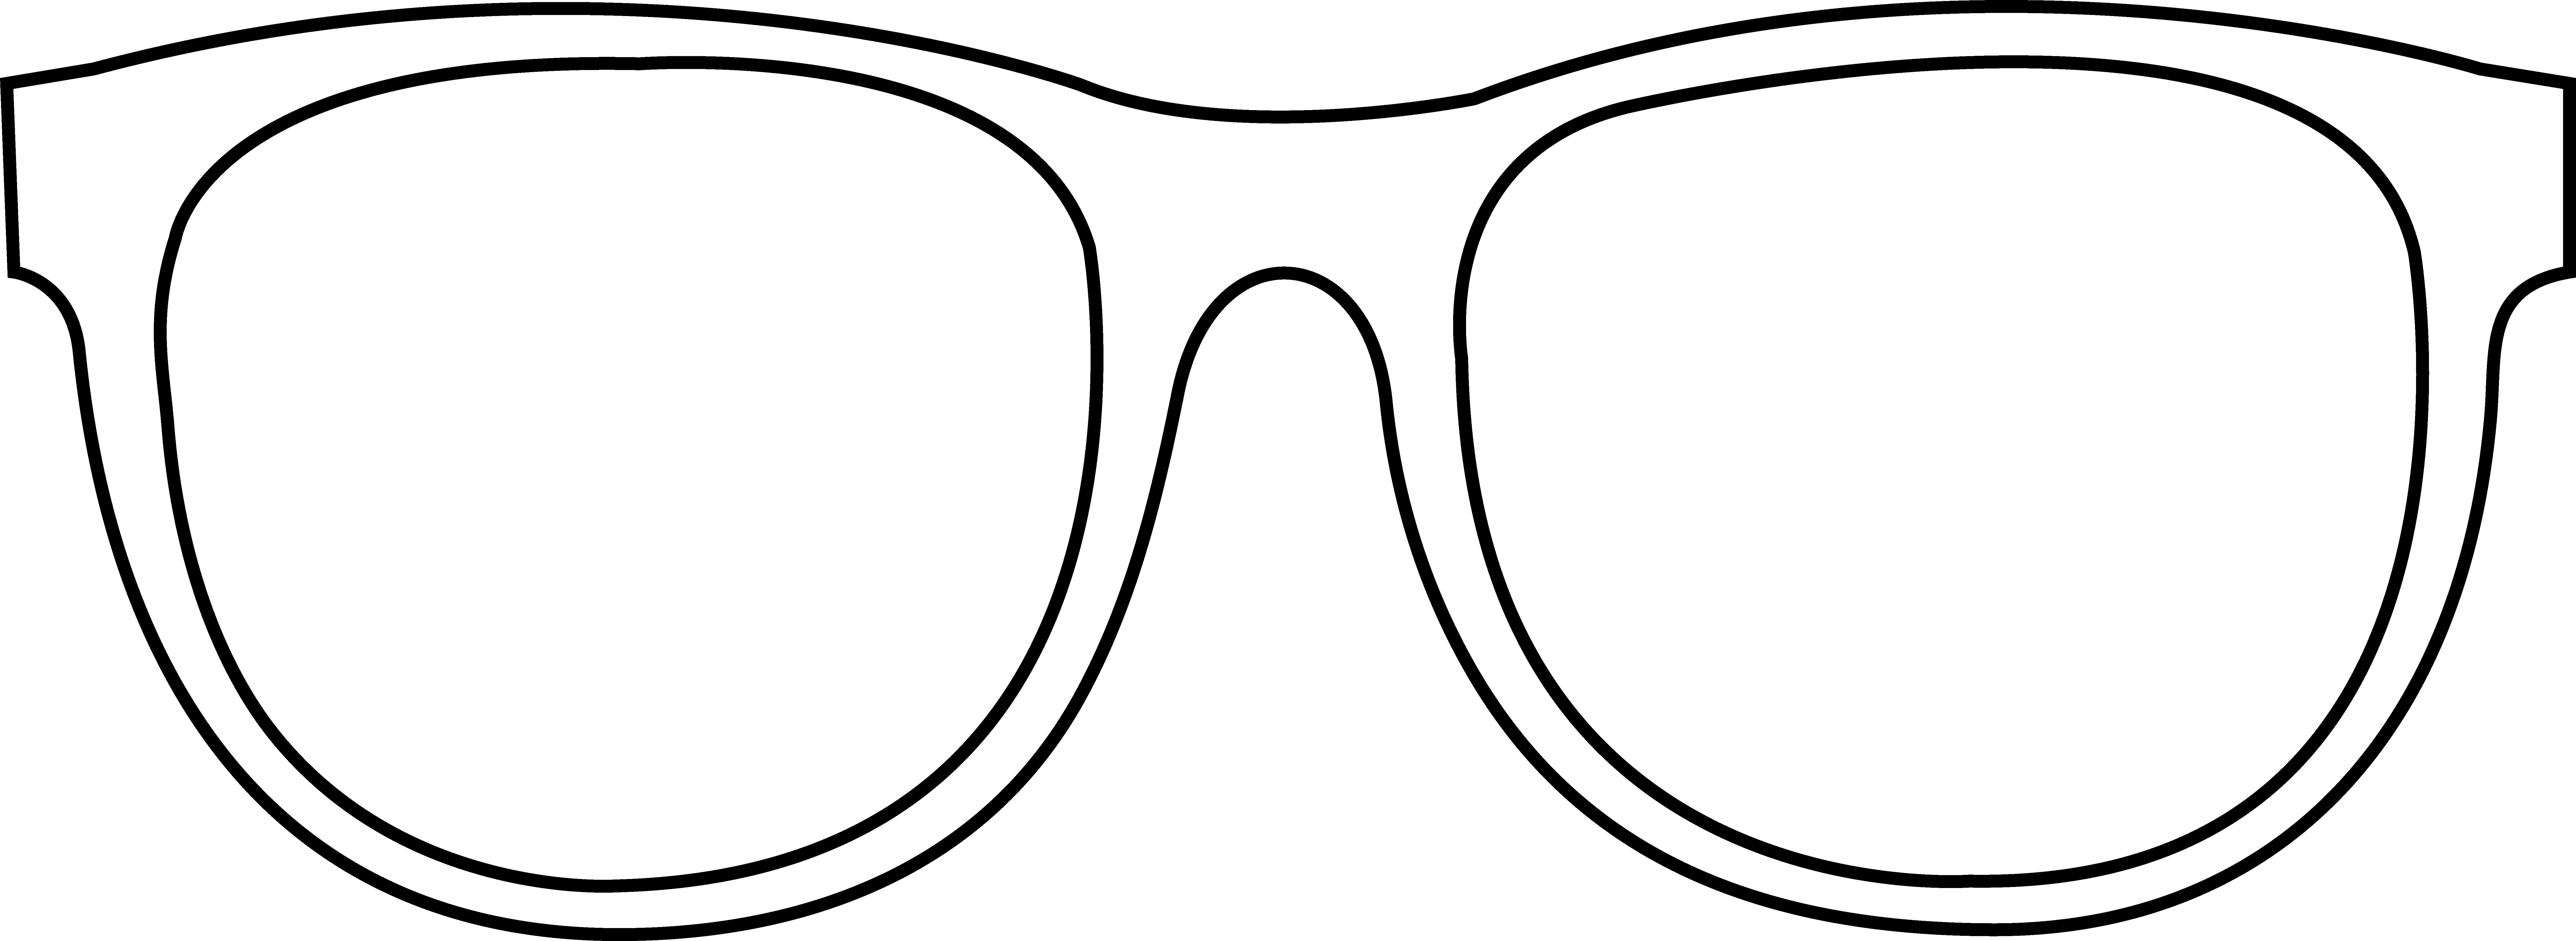 Sun glass cutout clipart jpg freeuse library Green Sunglasses Clipart | Clipart Panda - Free Clipart Images jpg freeuse library